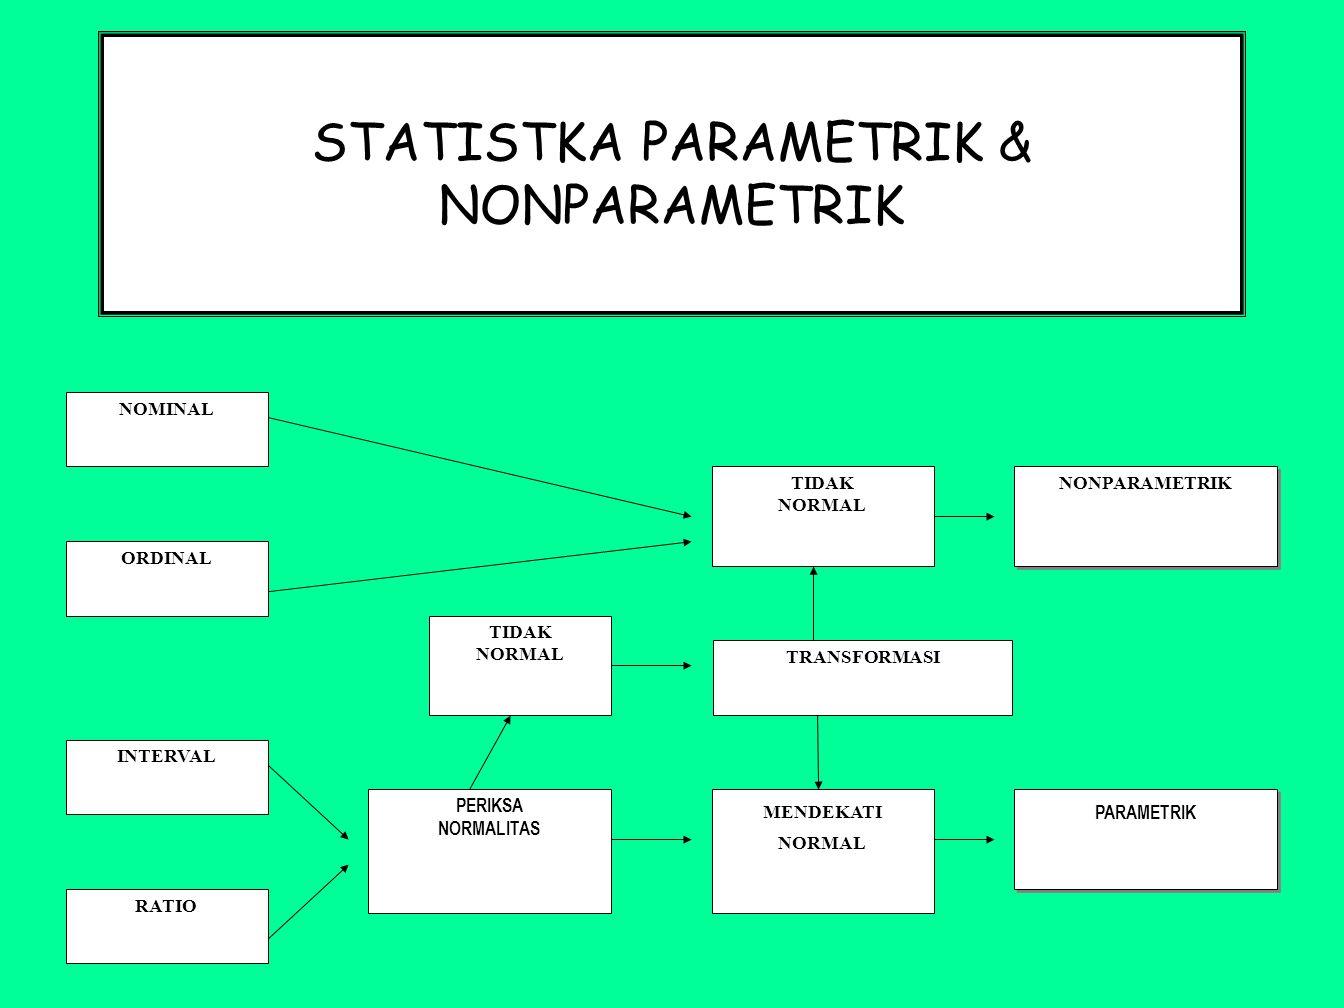 STATISTKA PARAMETRIK & NONPARAMETRIK